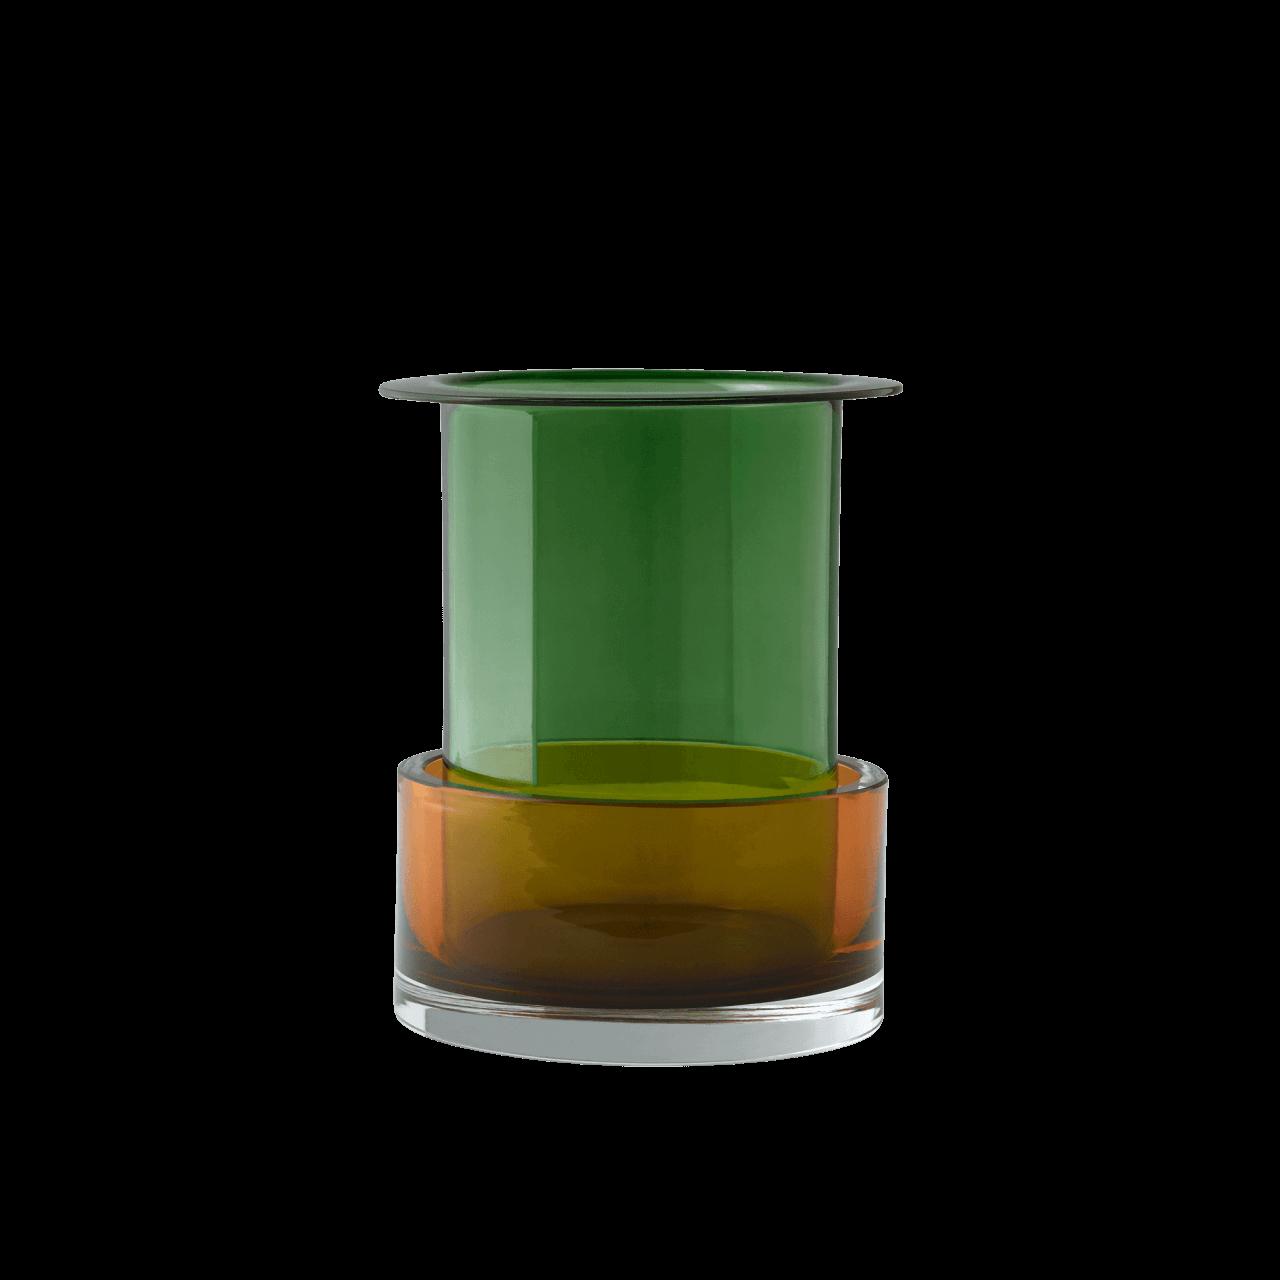 Tricolore Vase